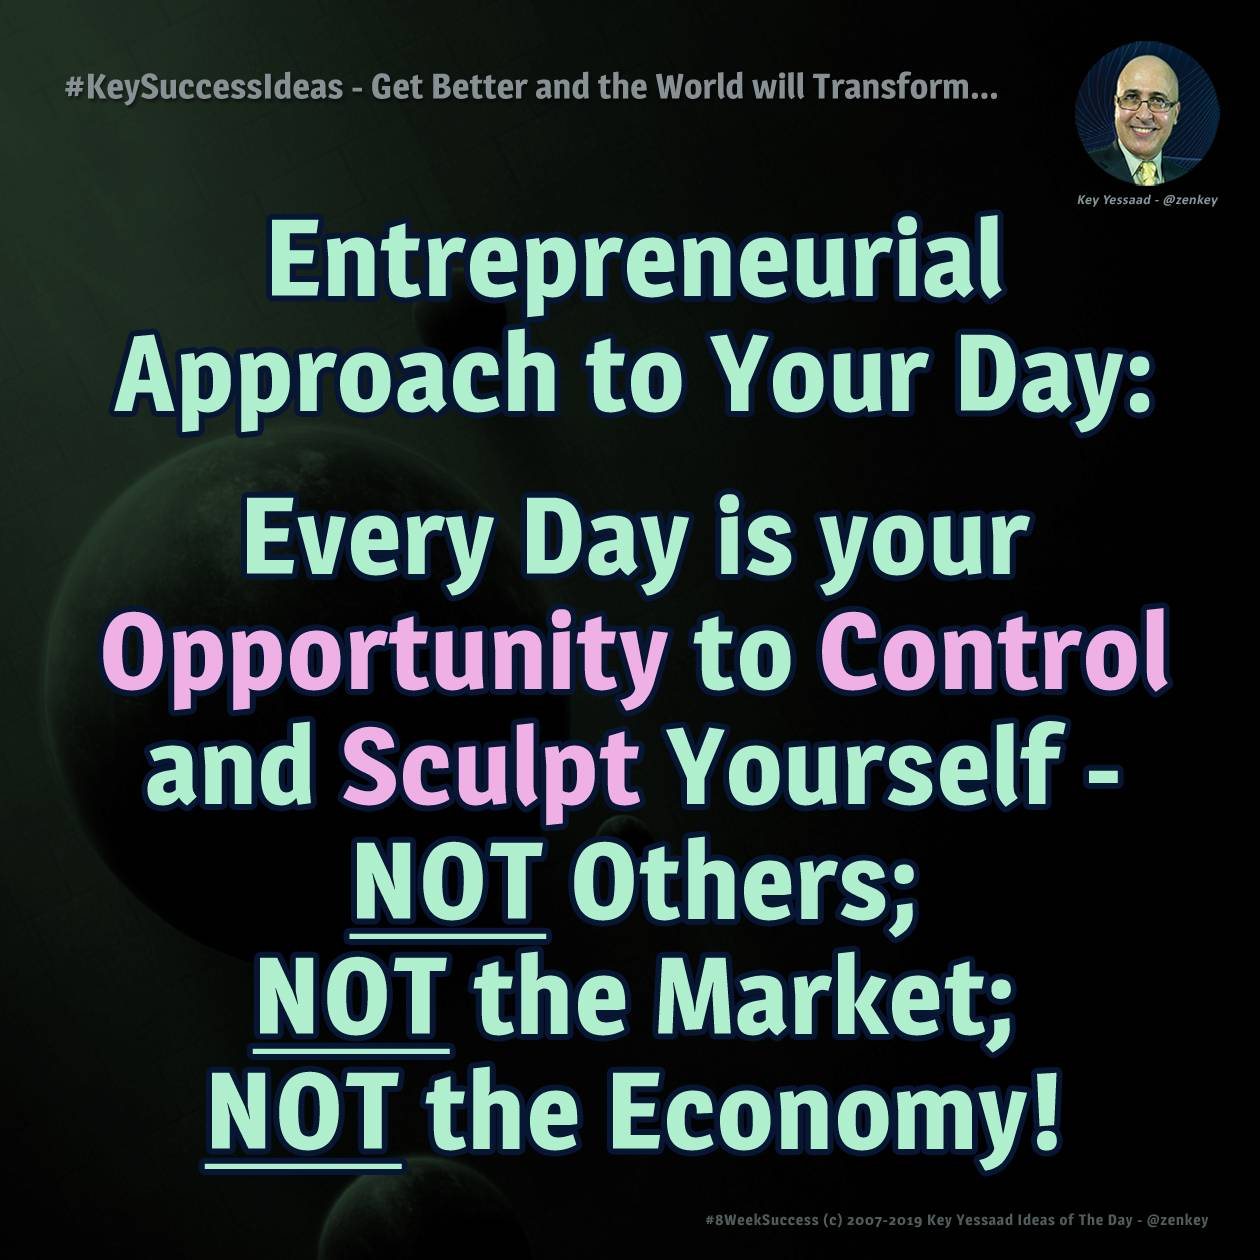 #KeySuccessIdeas - Get Better and the World will Transform...